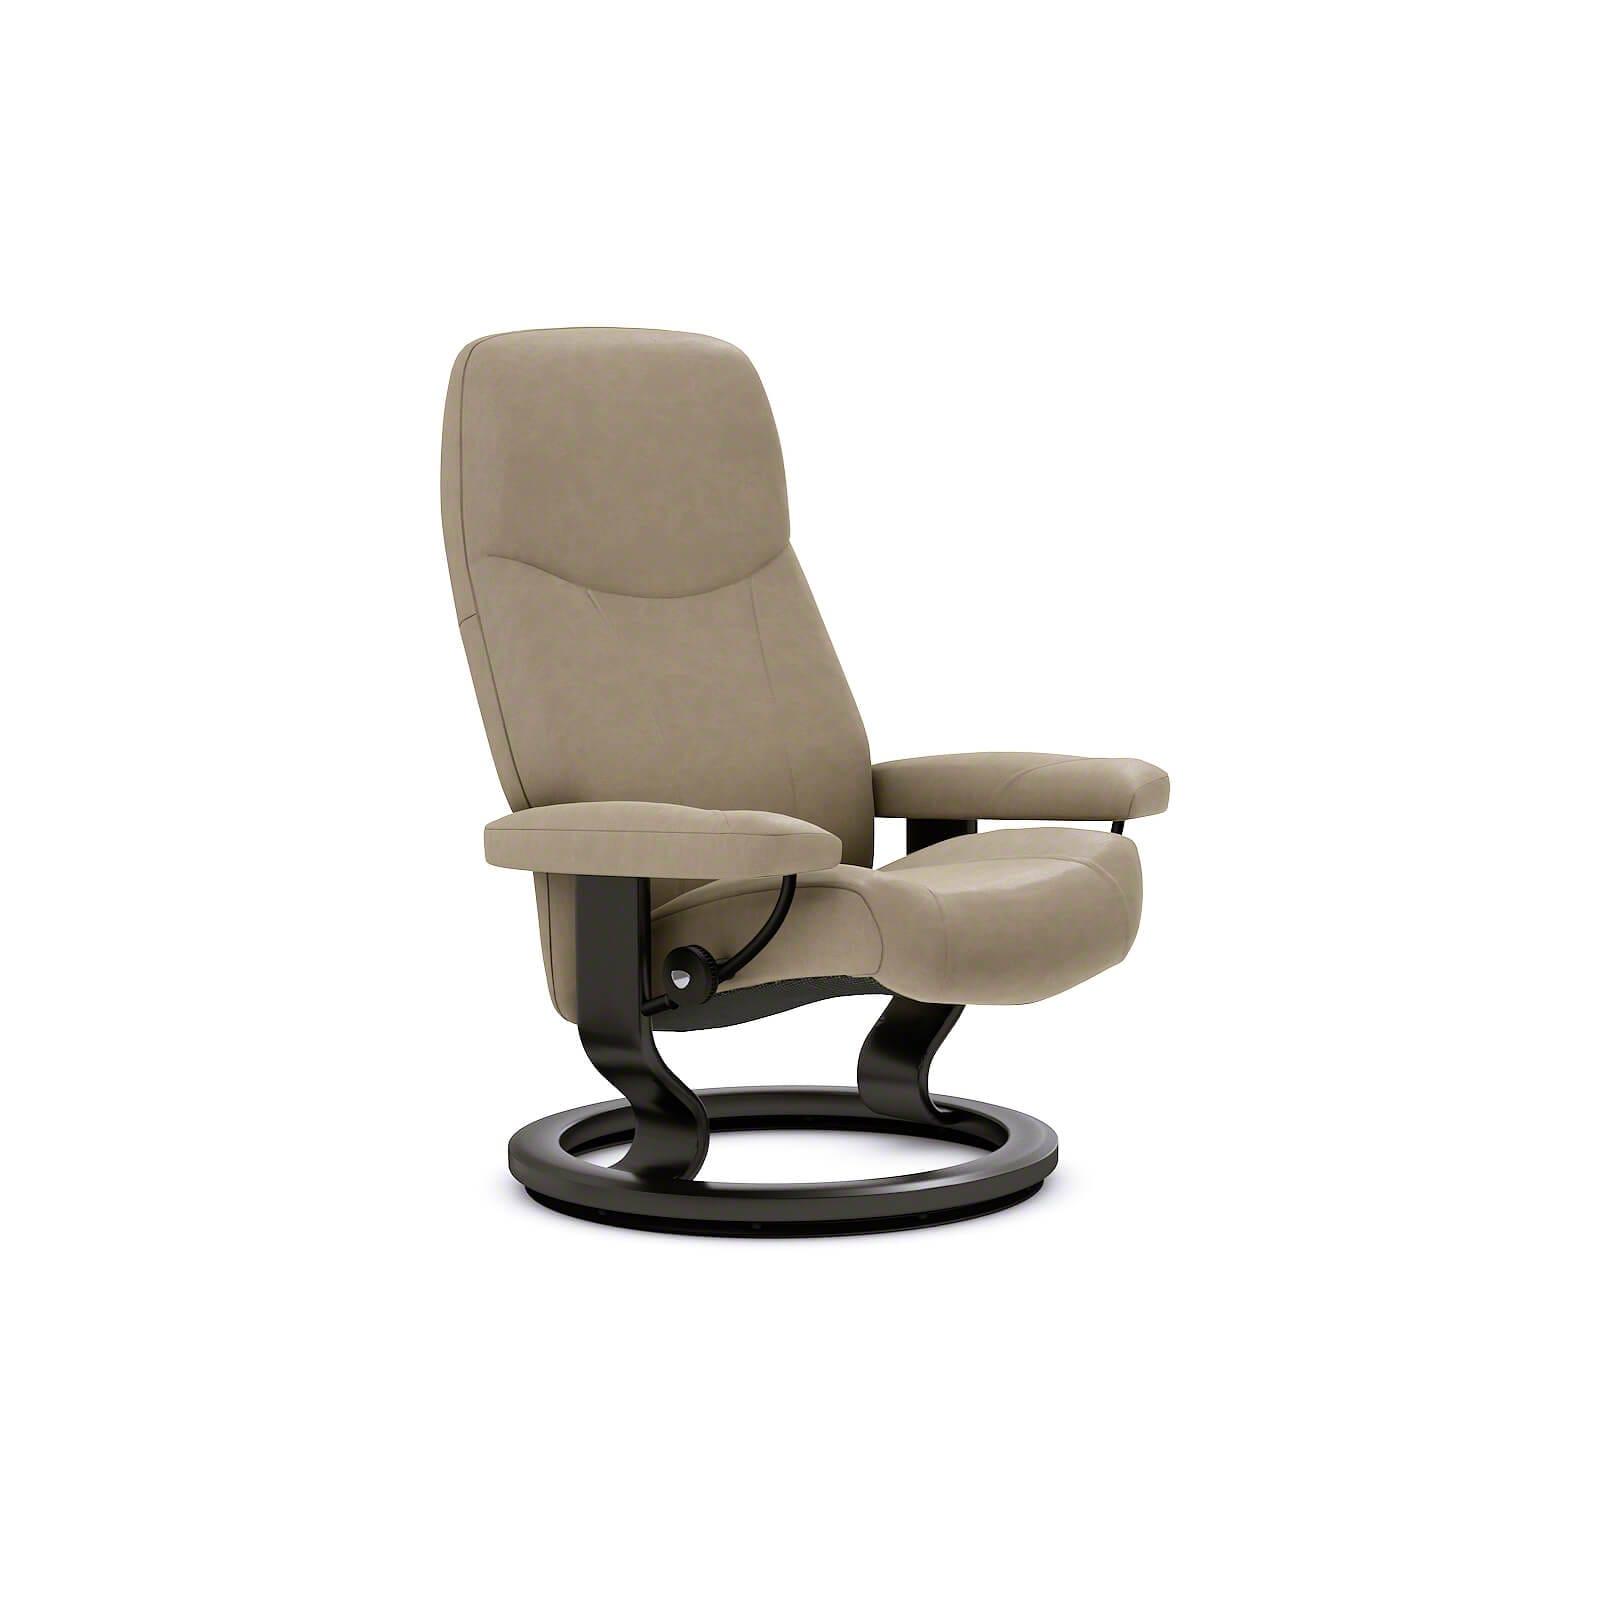 stressless consul sessel batick mole ohne hocker stressless. Black Bedroom Furniture Sets. Home Design Ideas